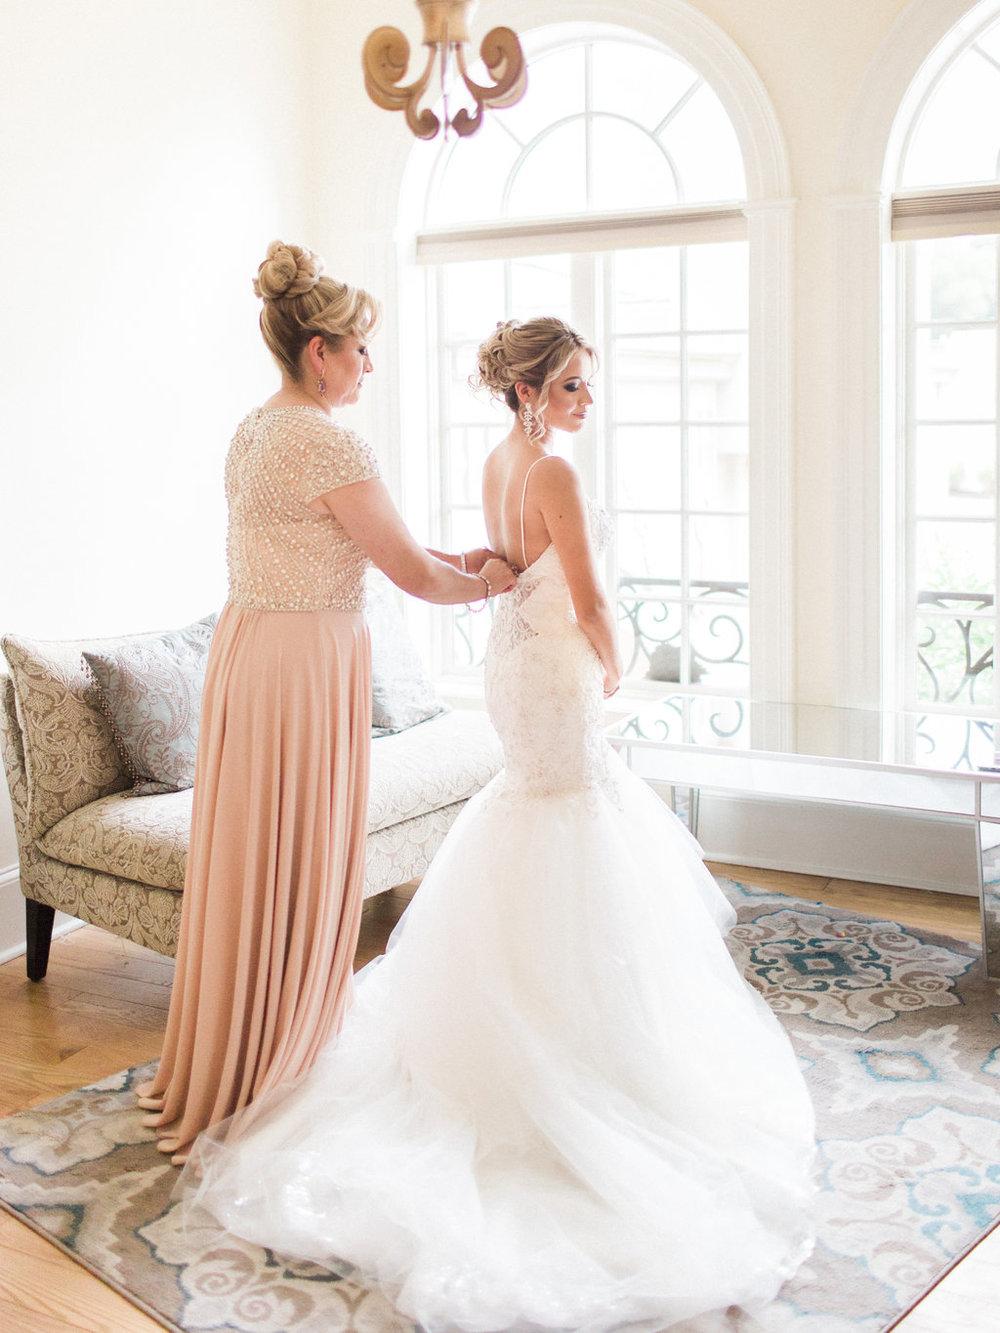 Morais-Vineyards-Winery-Beatleton-Virginia-Wedding-Photographer-9.jpg